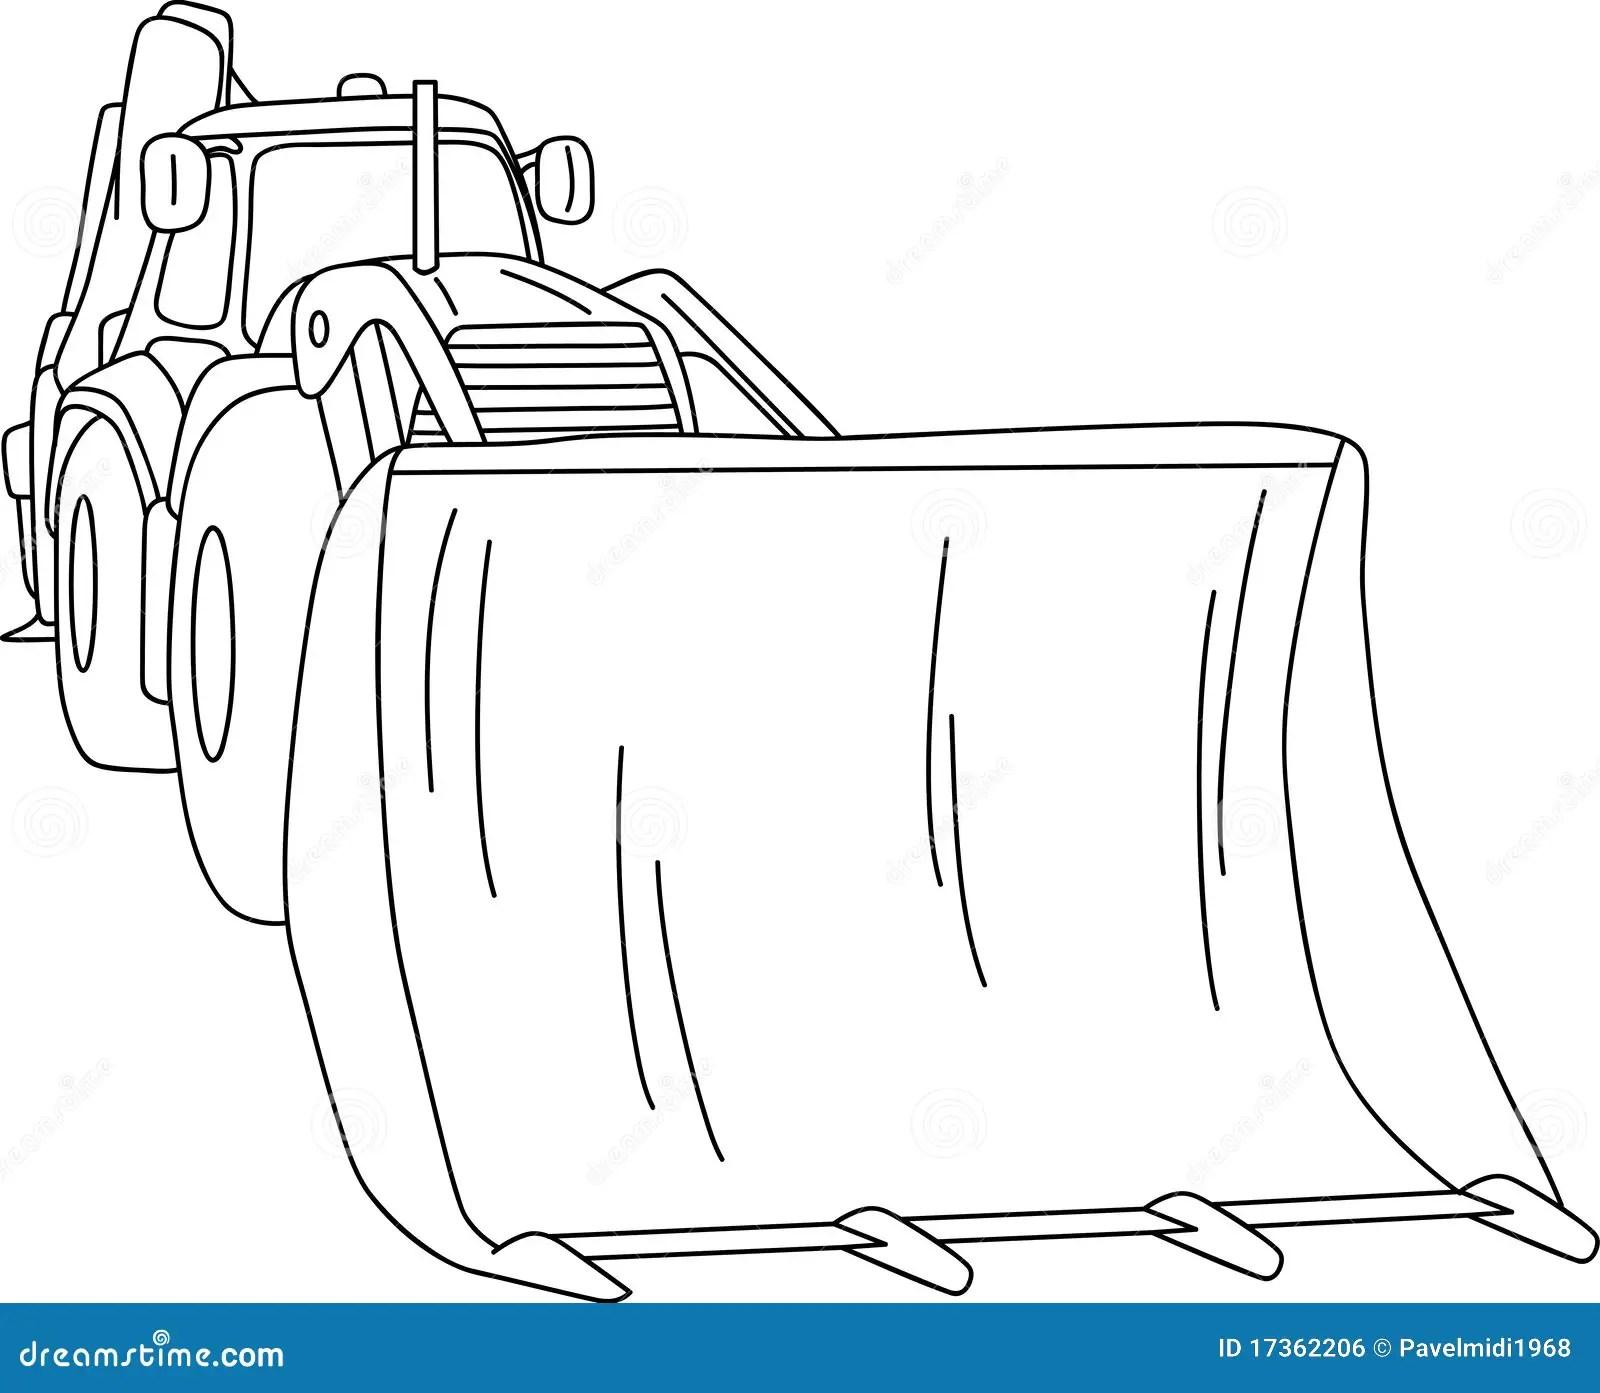 Dozer Stock Vector Illustration Of Iron Line